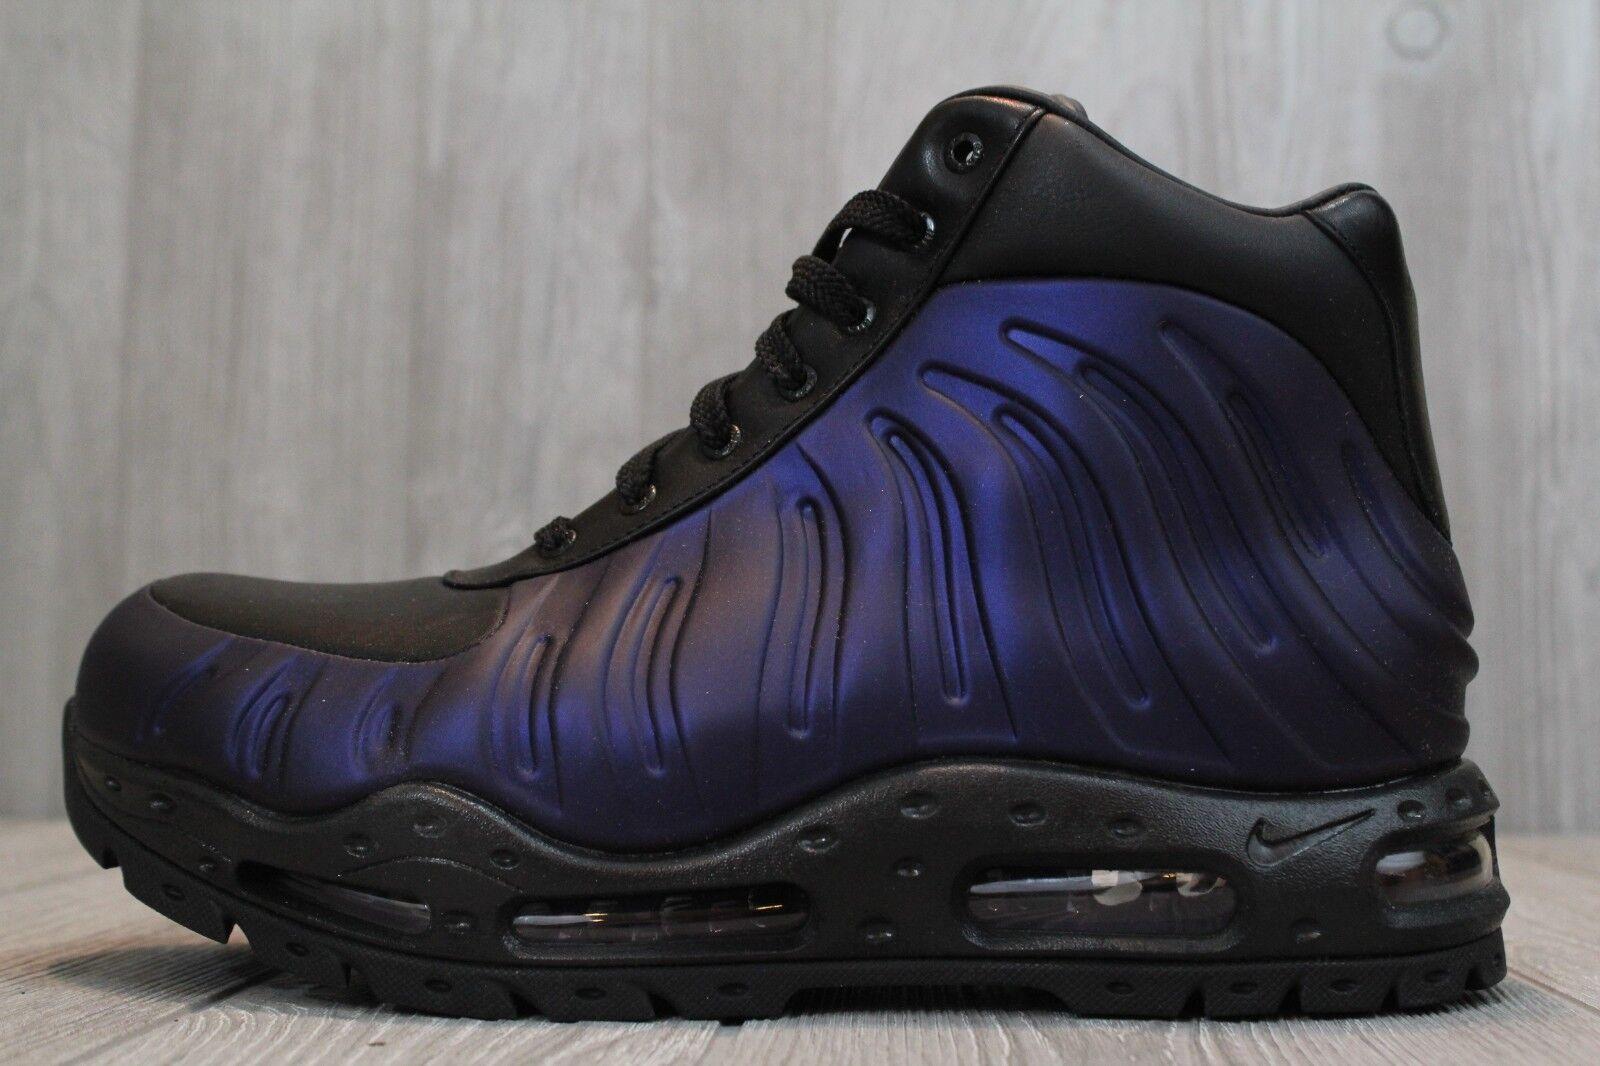 24 New Nike Air Max FoamDome Eggplant Black 500 Boots Sizes 6-13 843749 500 Black 90052c